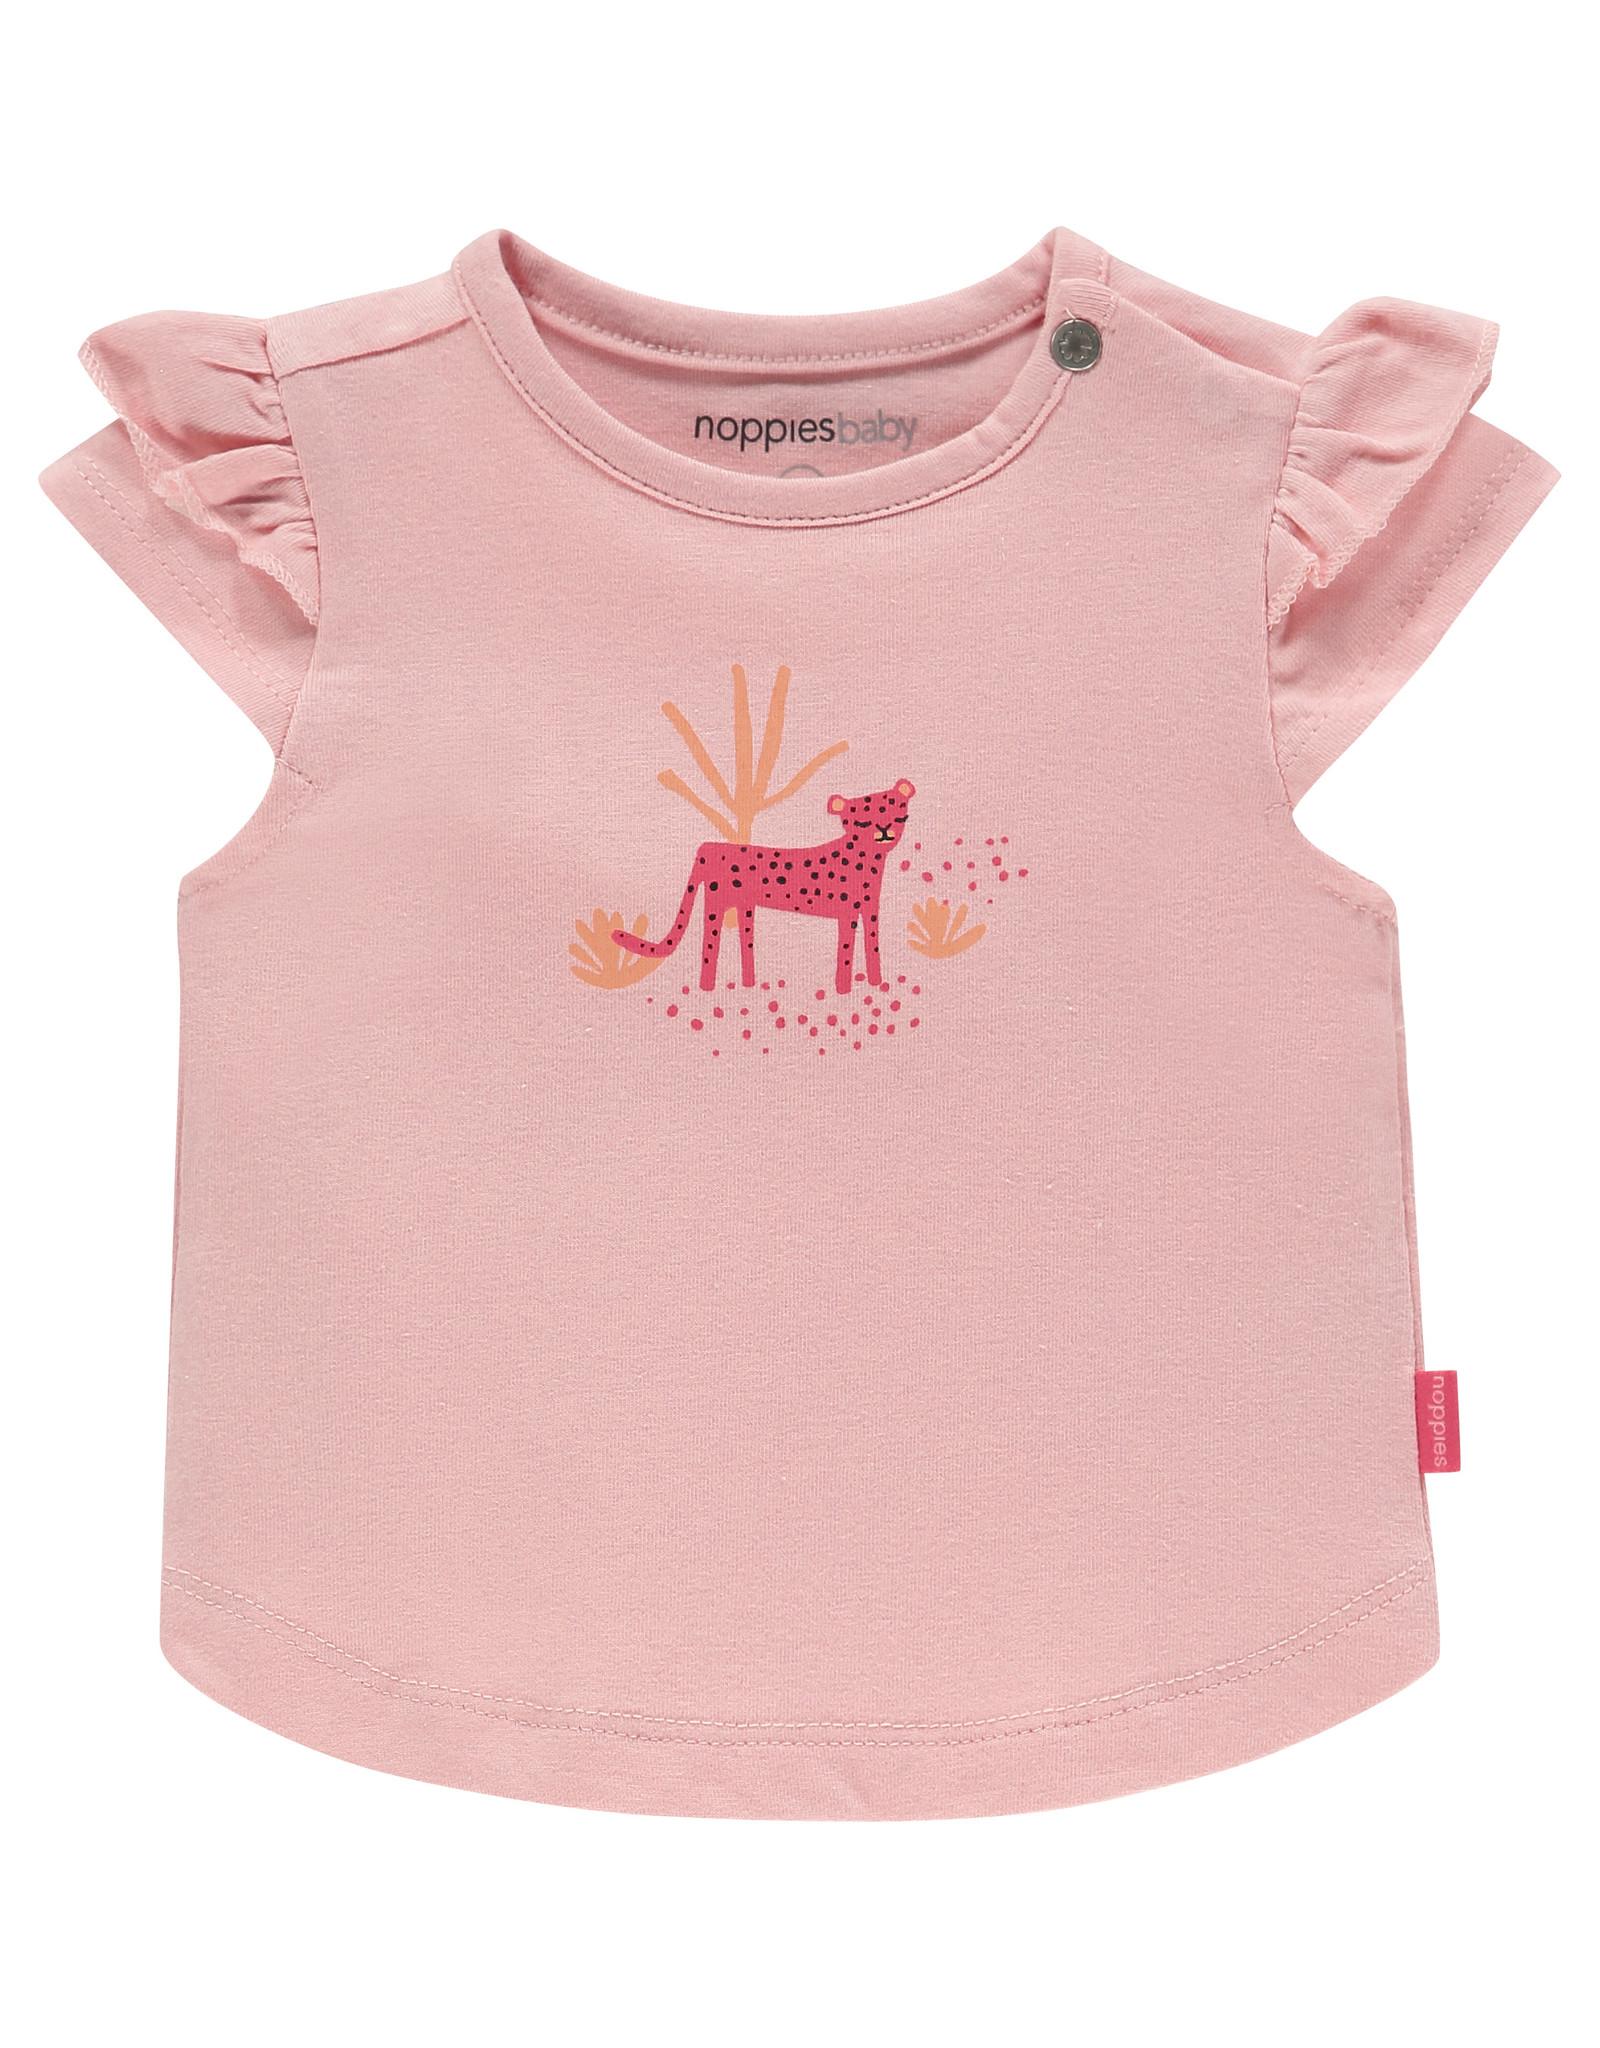 Noppies G Regular T-shirt ss Chino, Impatiens Pink